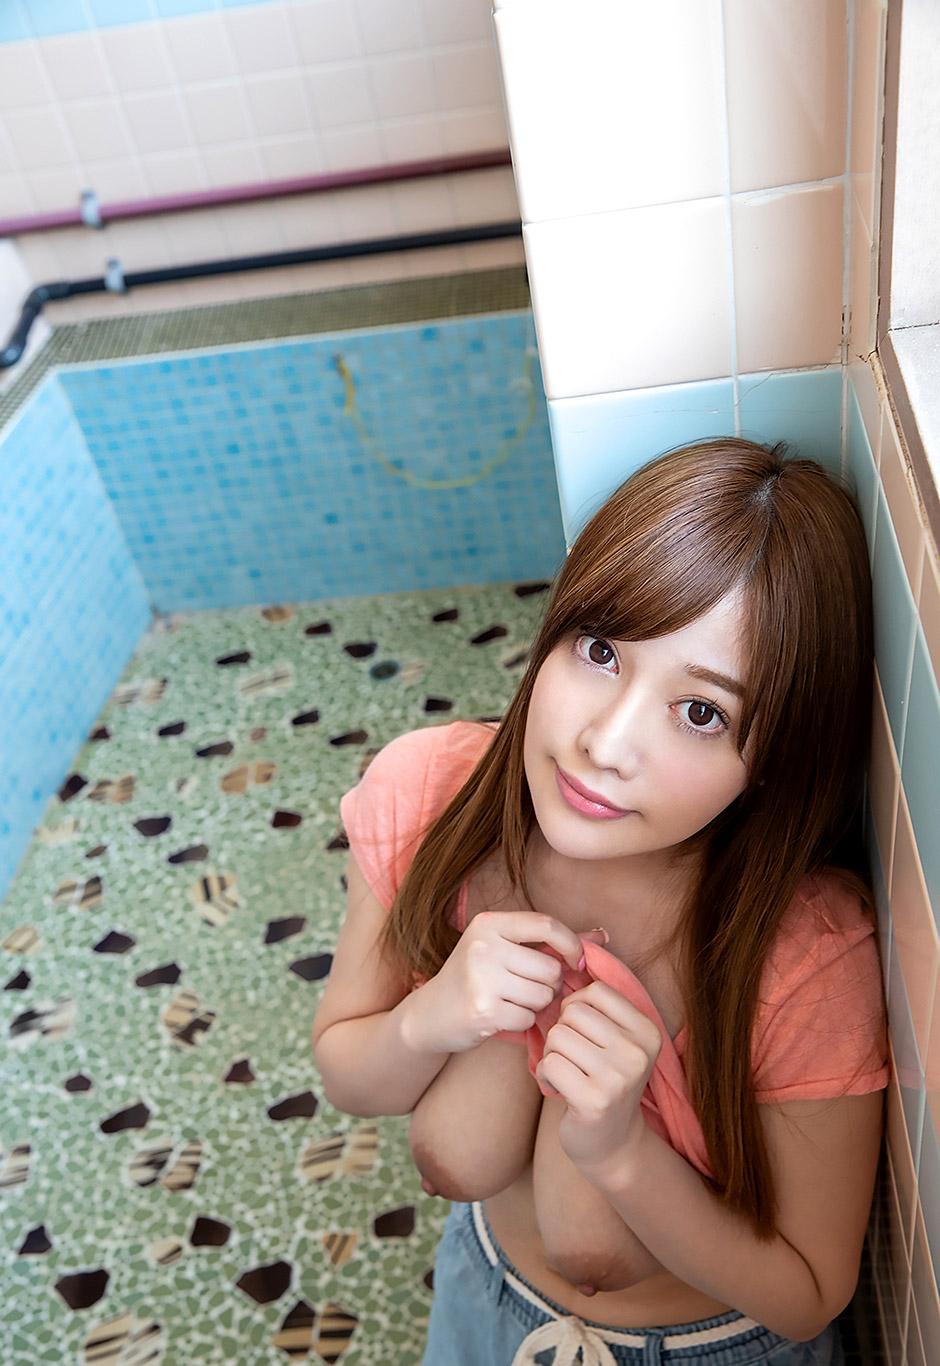 image http://scanlover.com/assets/images/272-DWAdTufixp1Wwoxl.jpeg